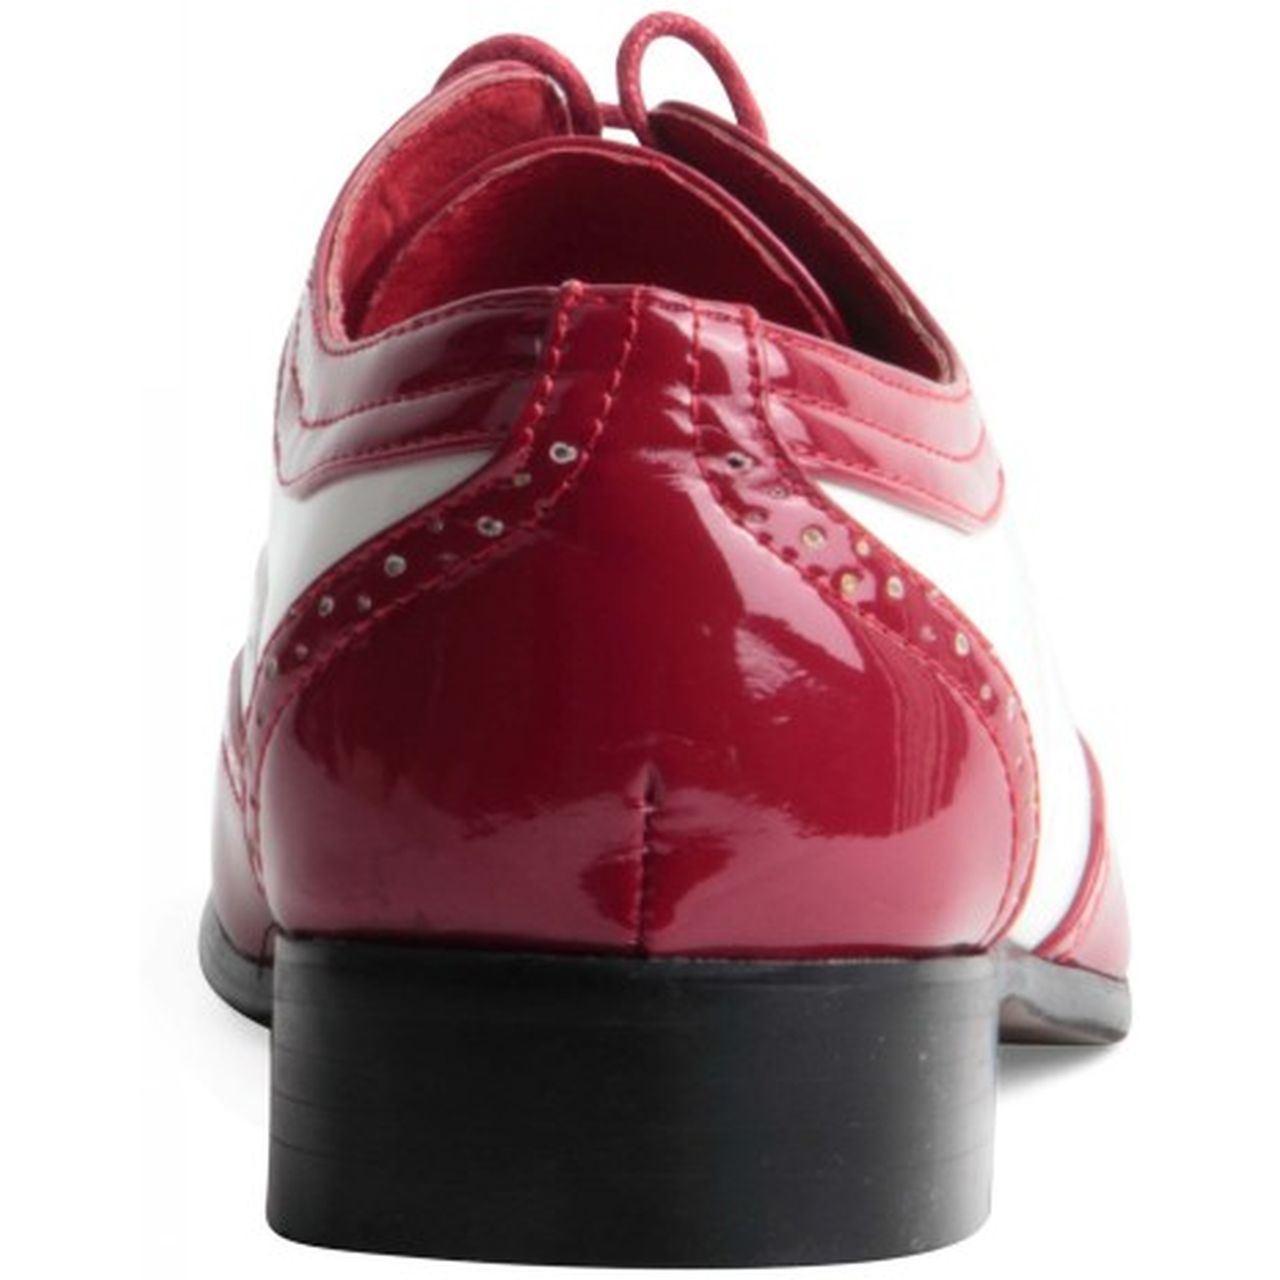 Mens Spectator Two Tone Black Red Wingtip Brogue Gangster Shoe